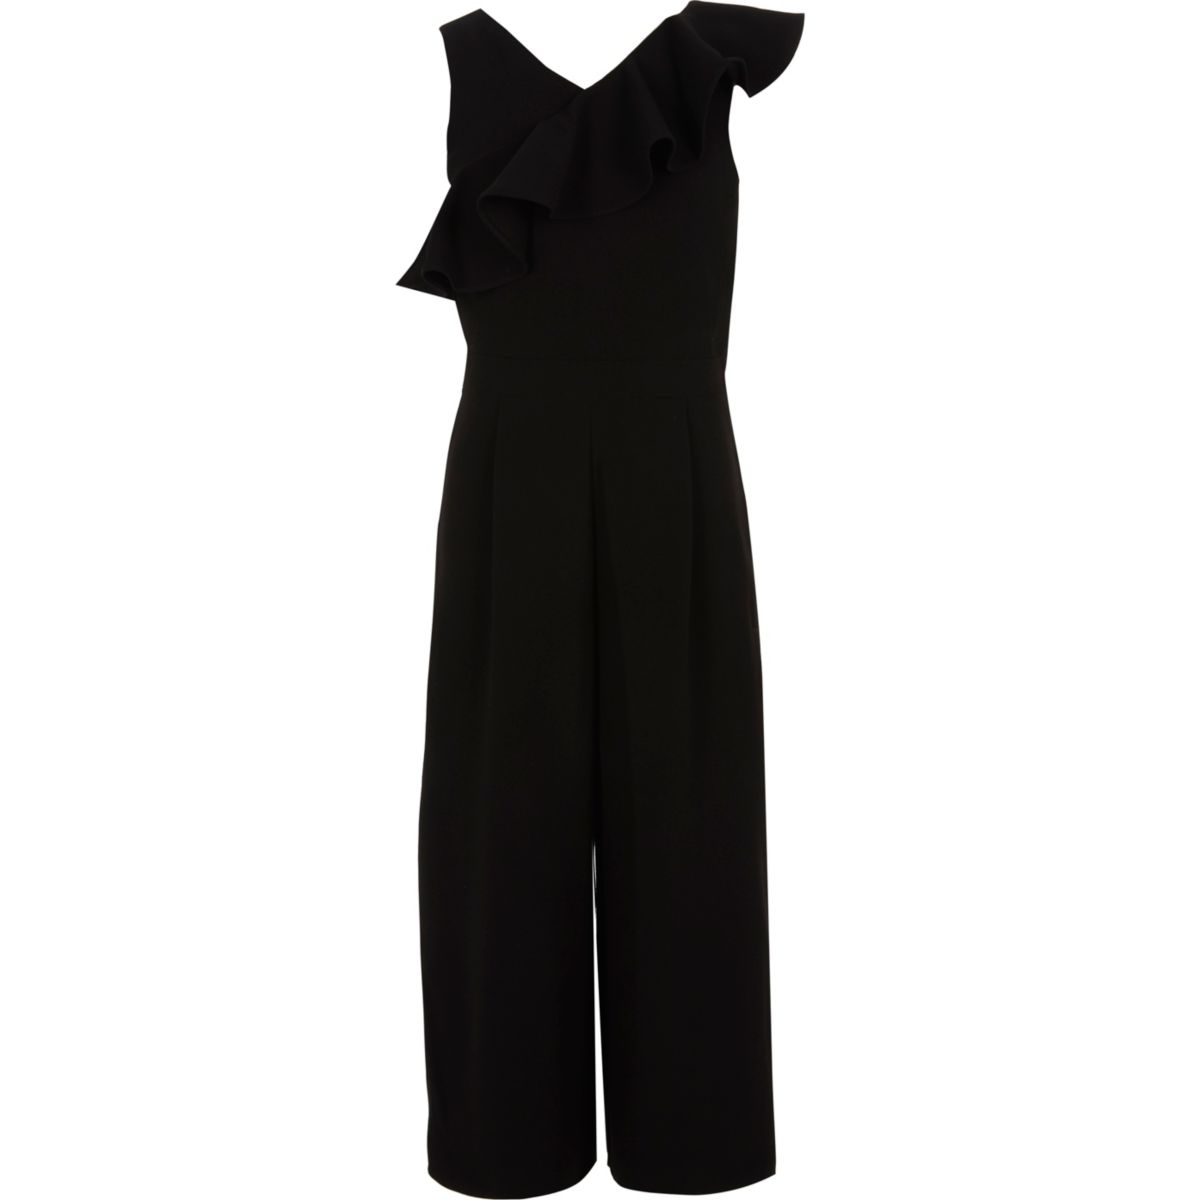 Girls black frill culotte jumpsuit